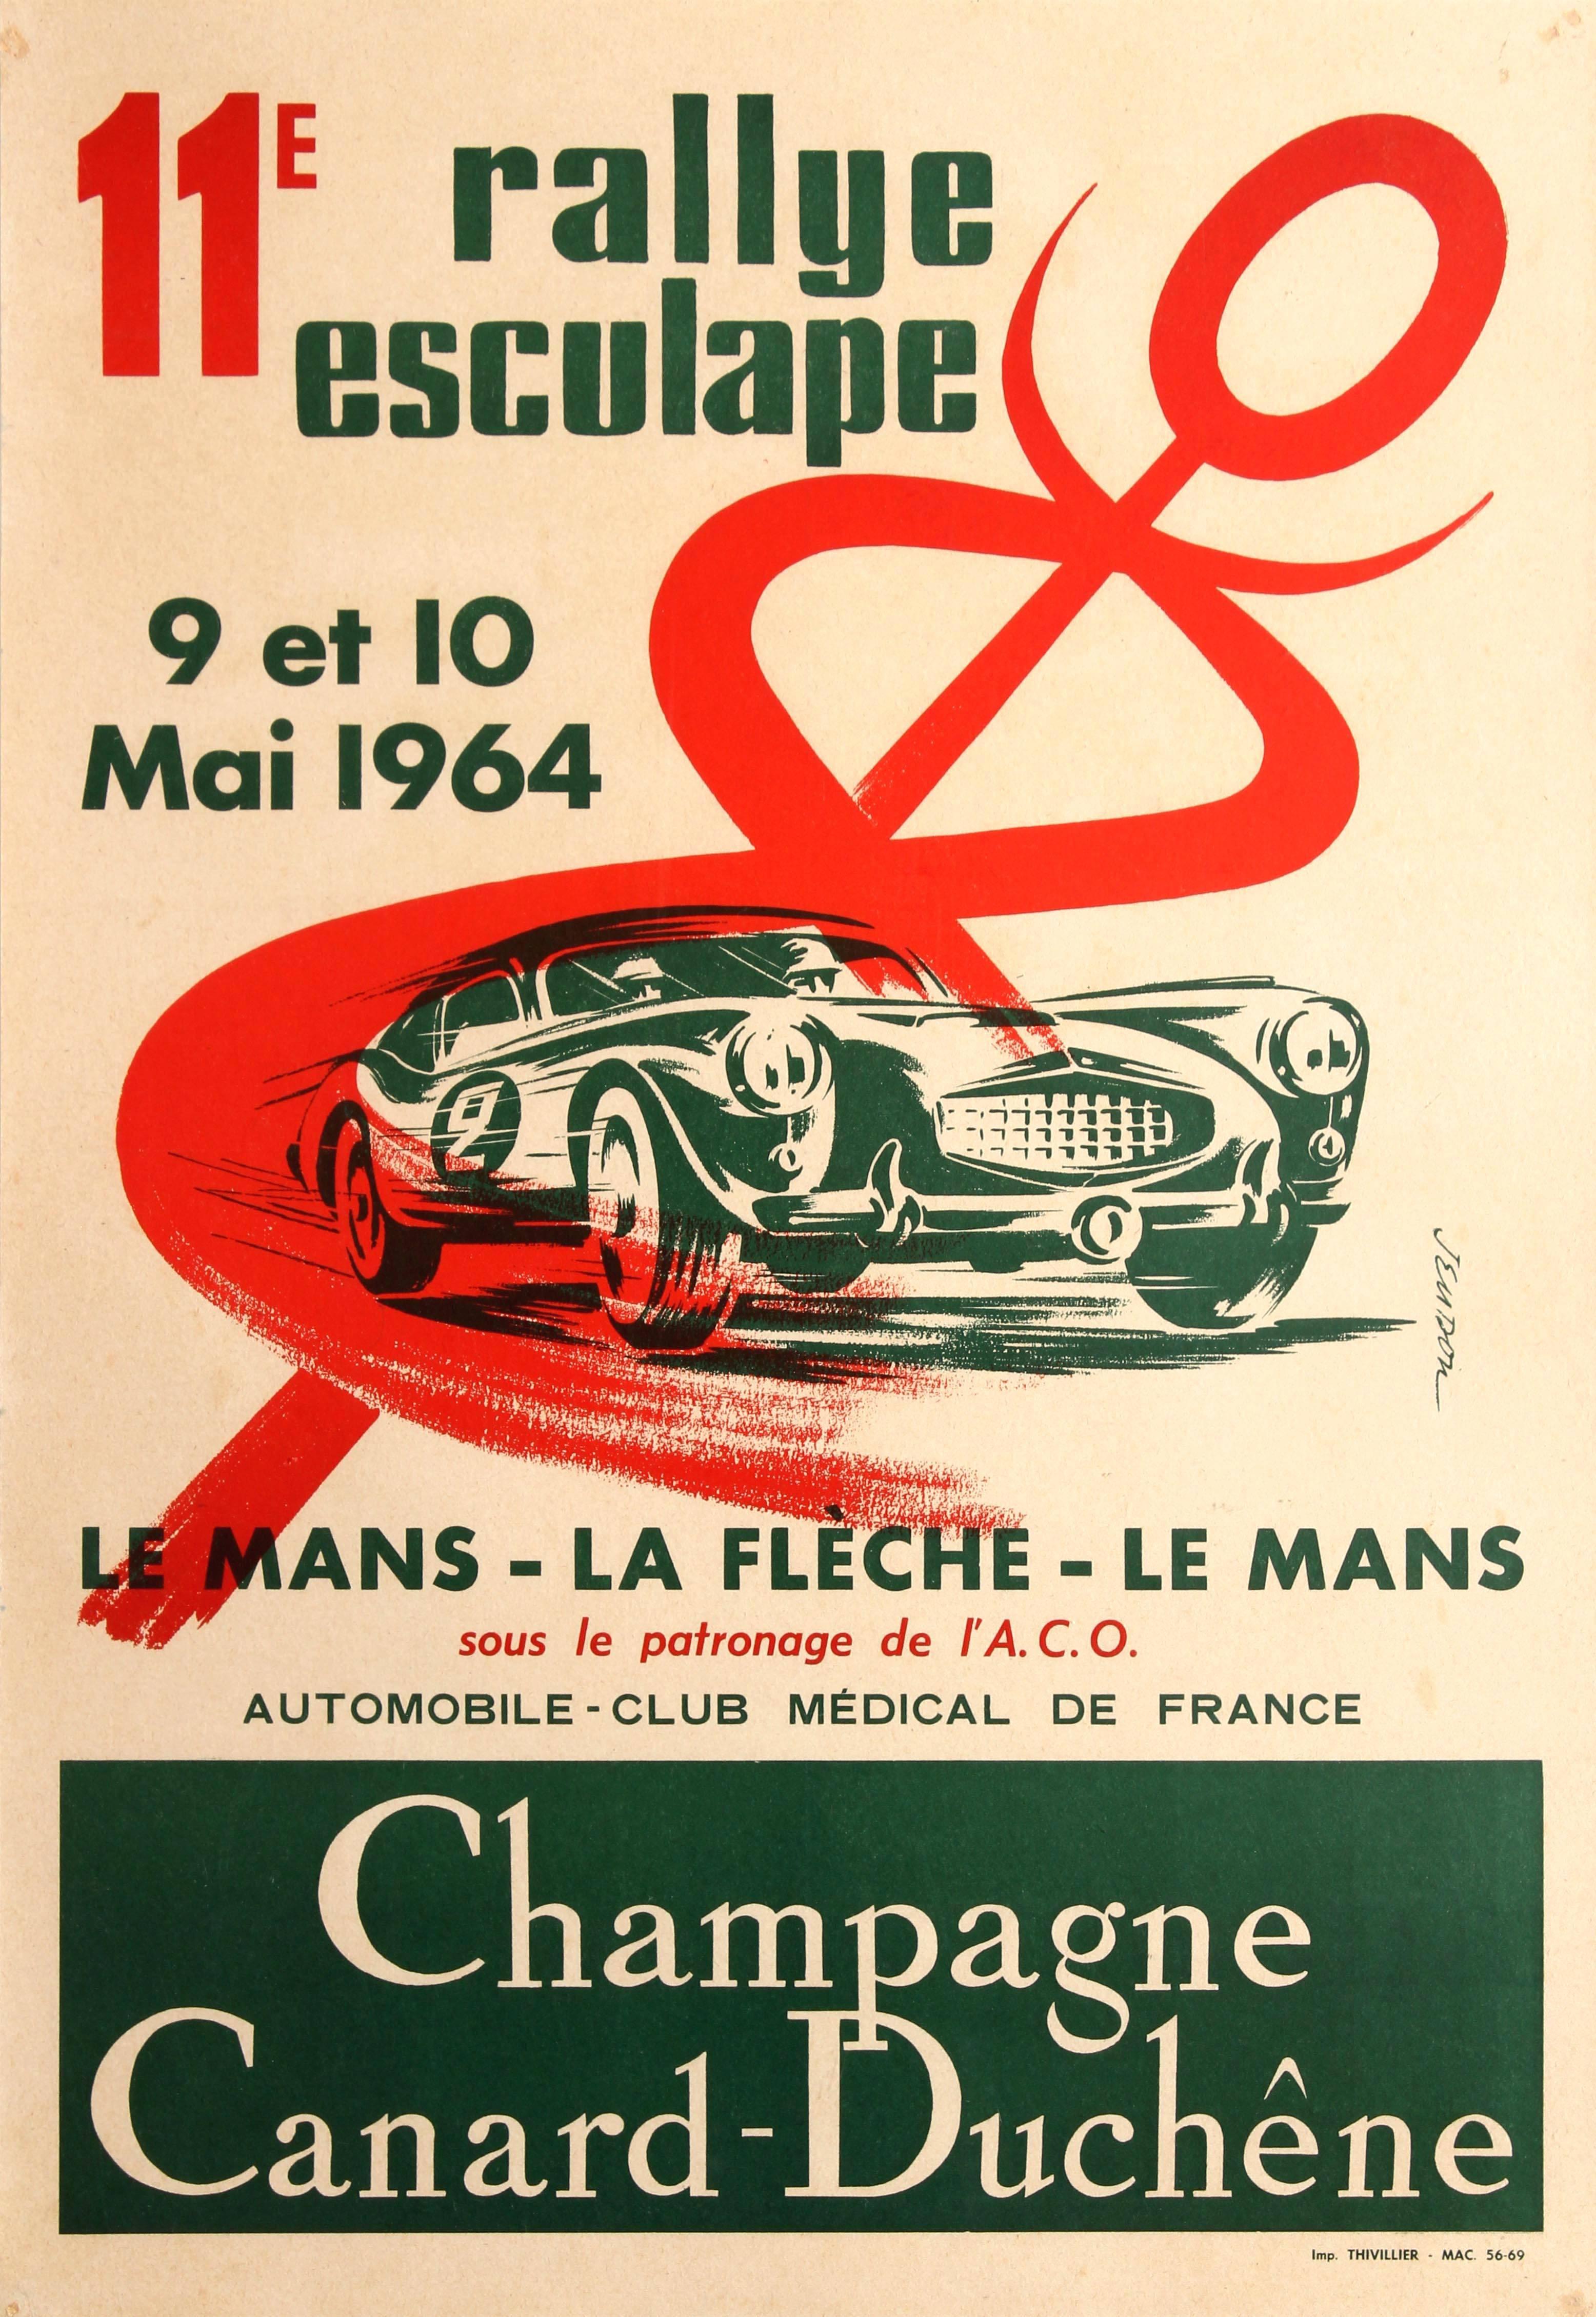 Original Sports Car Racing Poster For The 11th Rally Esculape Le Mans La Fleche